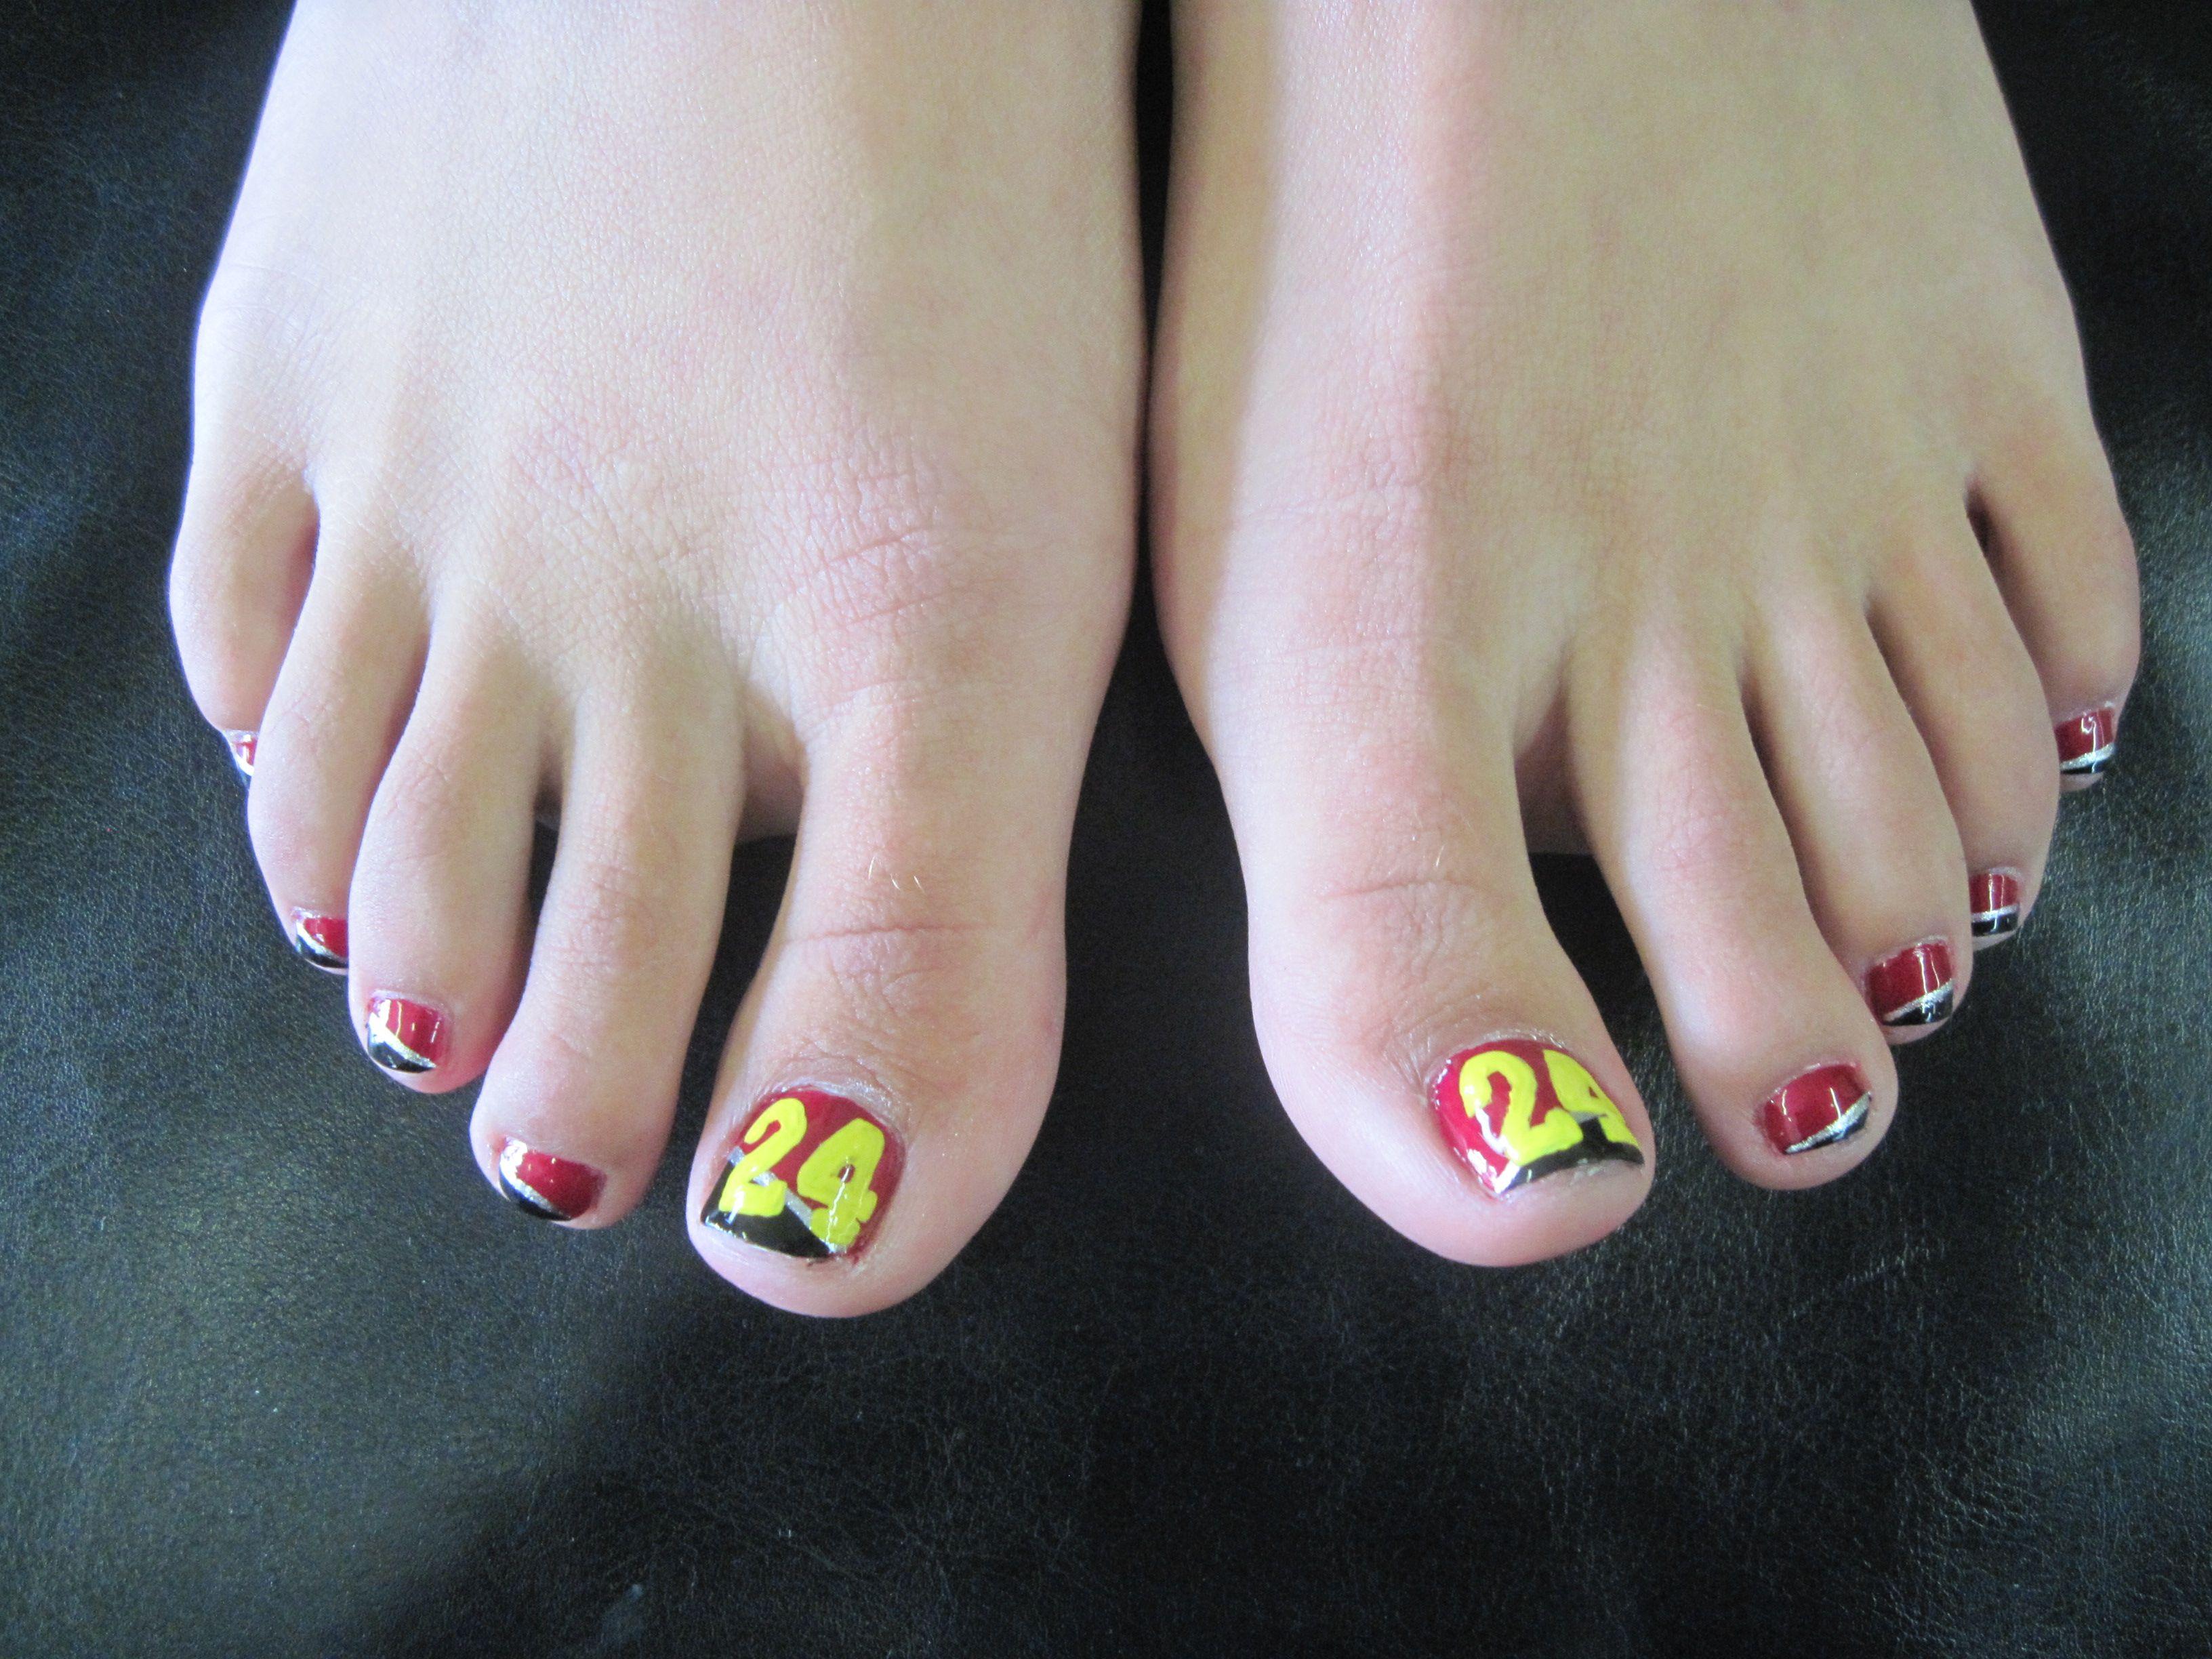 24 Jeff Gordon Nail Art Pedicure | My Manicure & Pedicure Work ...